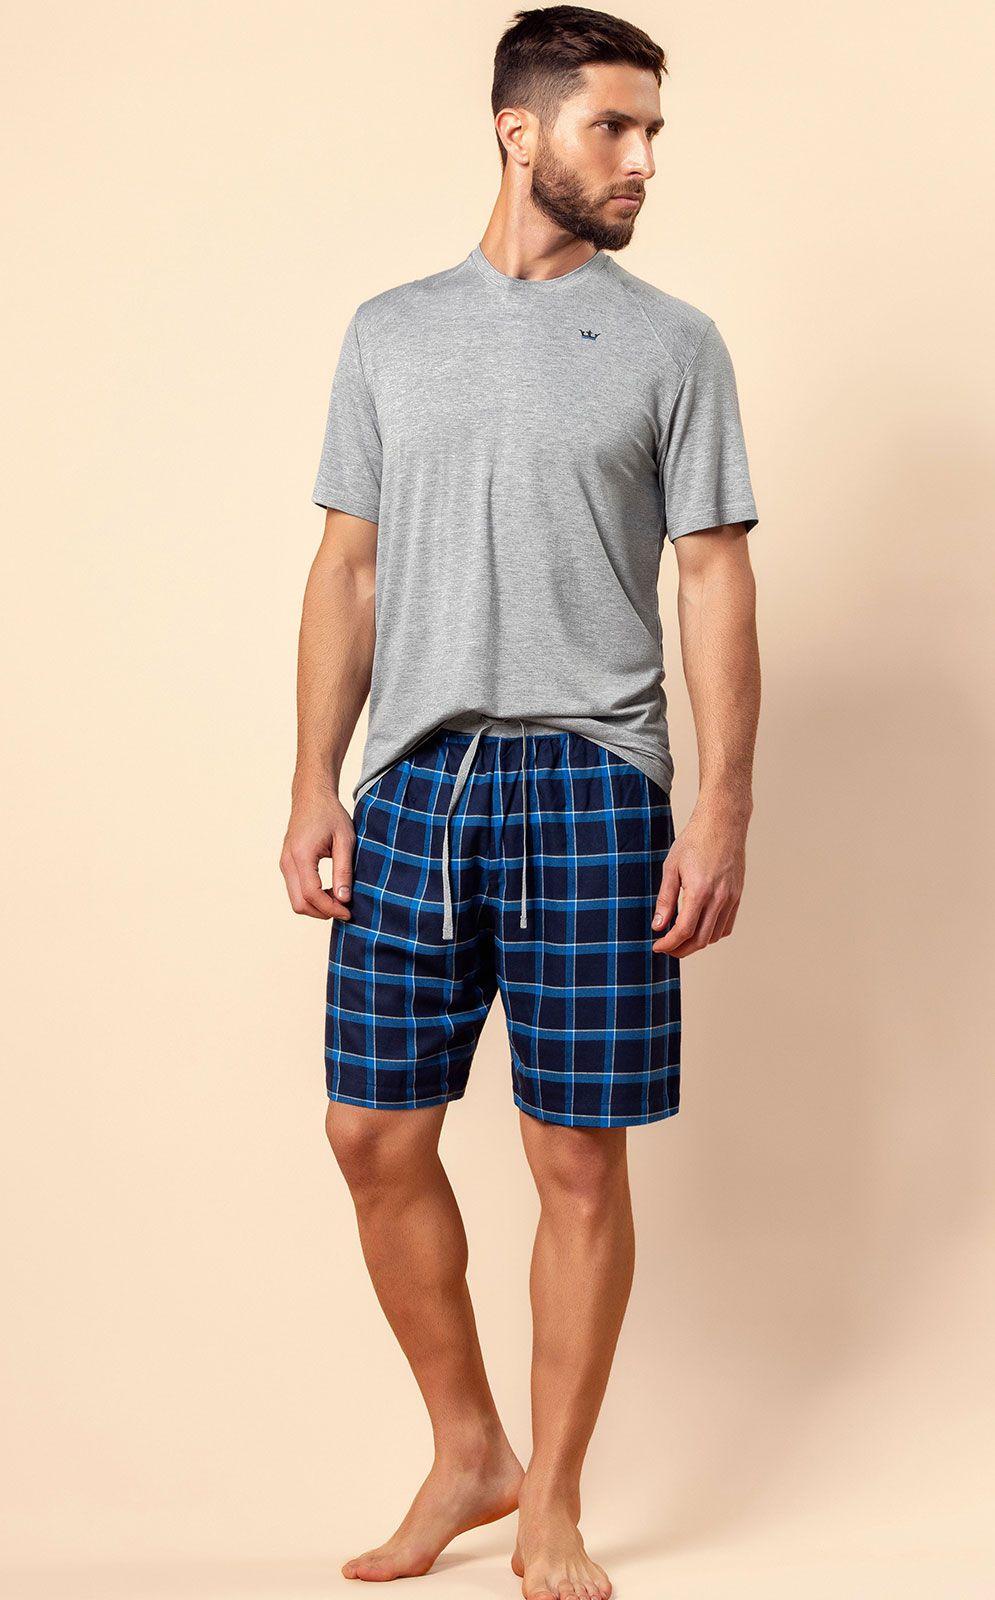 Pijama Masculino Adulto Mixte Blusa com bermuda Xadrez em Modal 9277